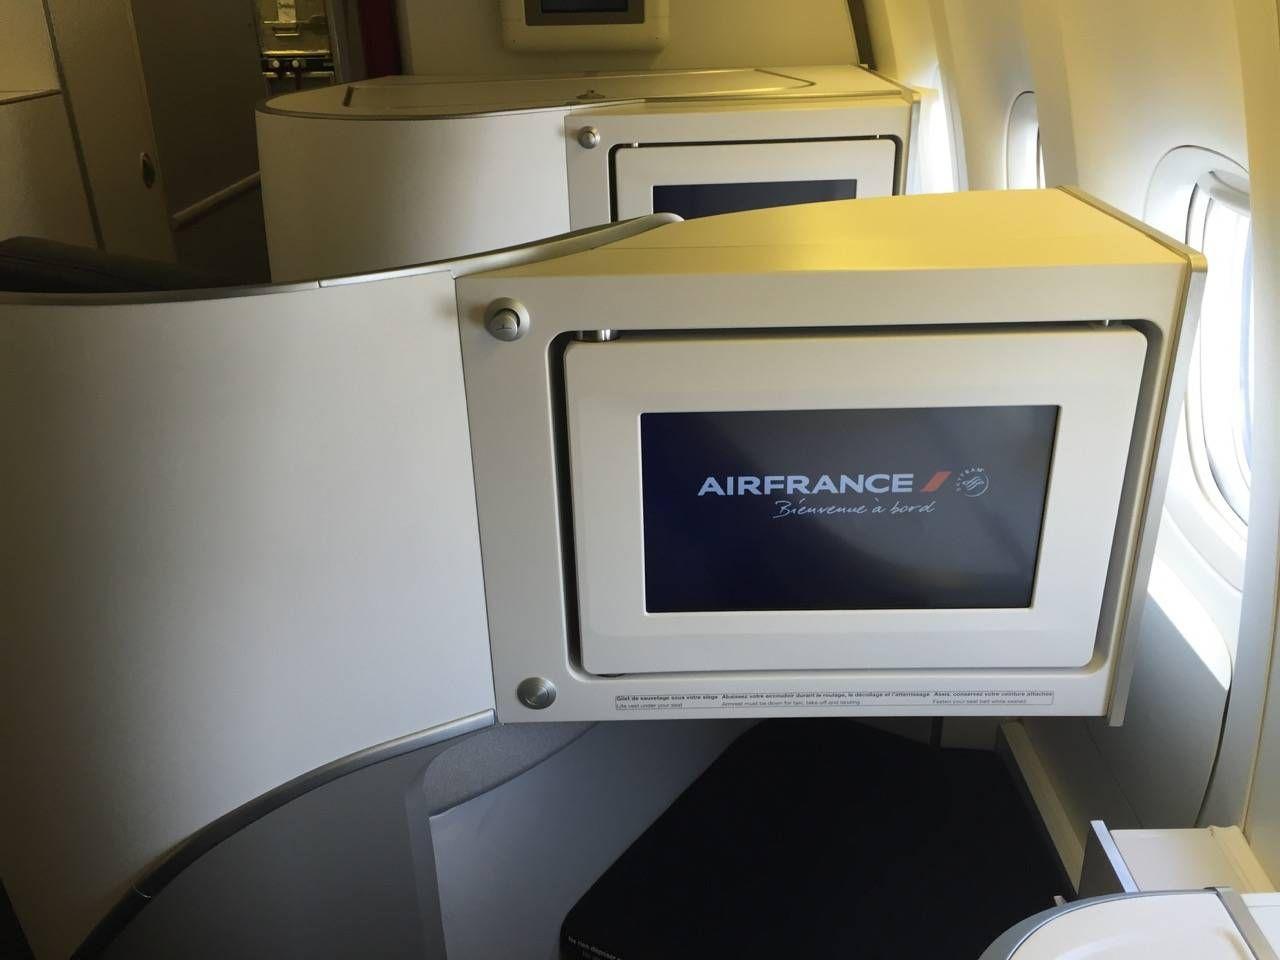 Air France New Business Class-04